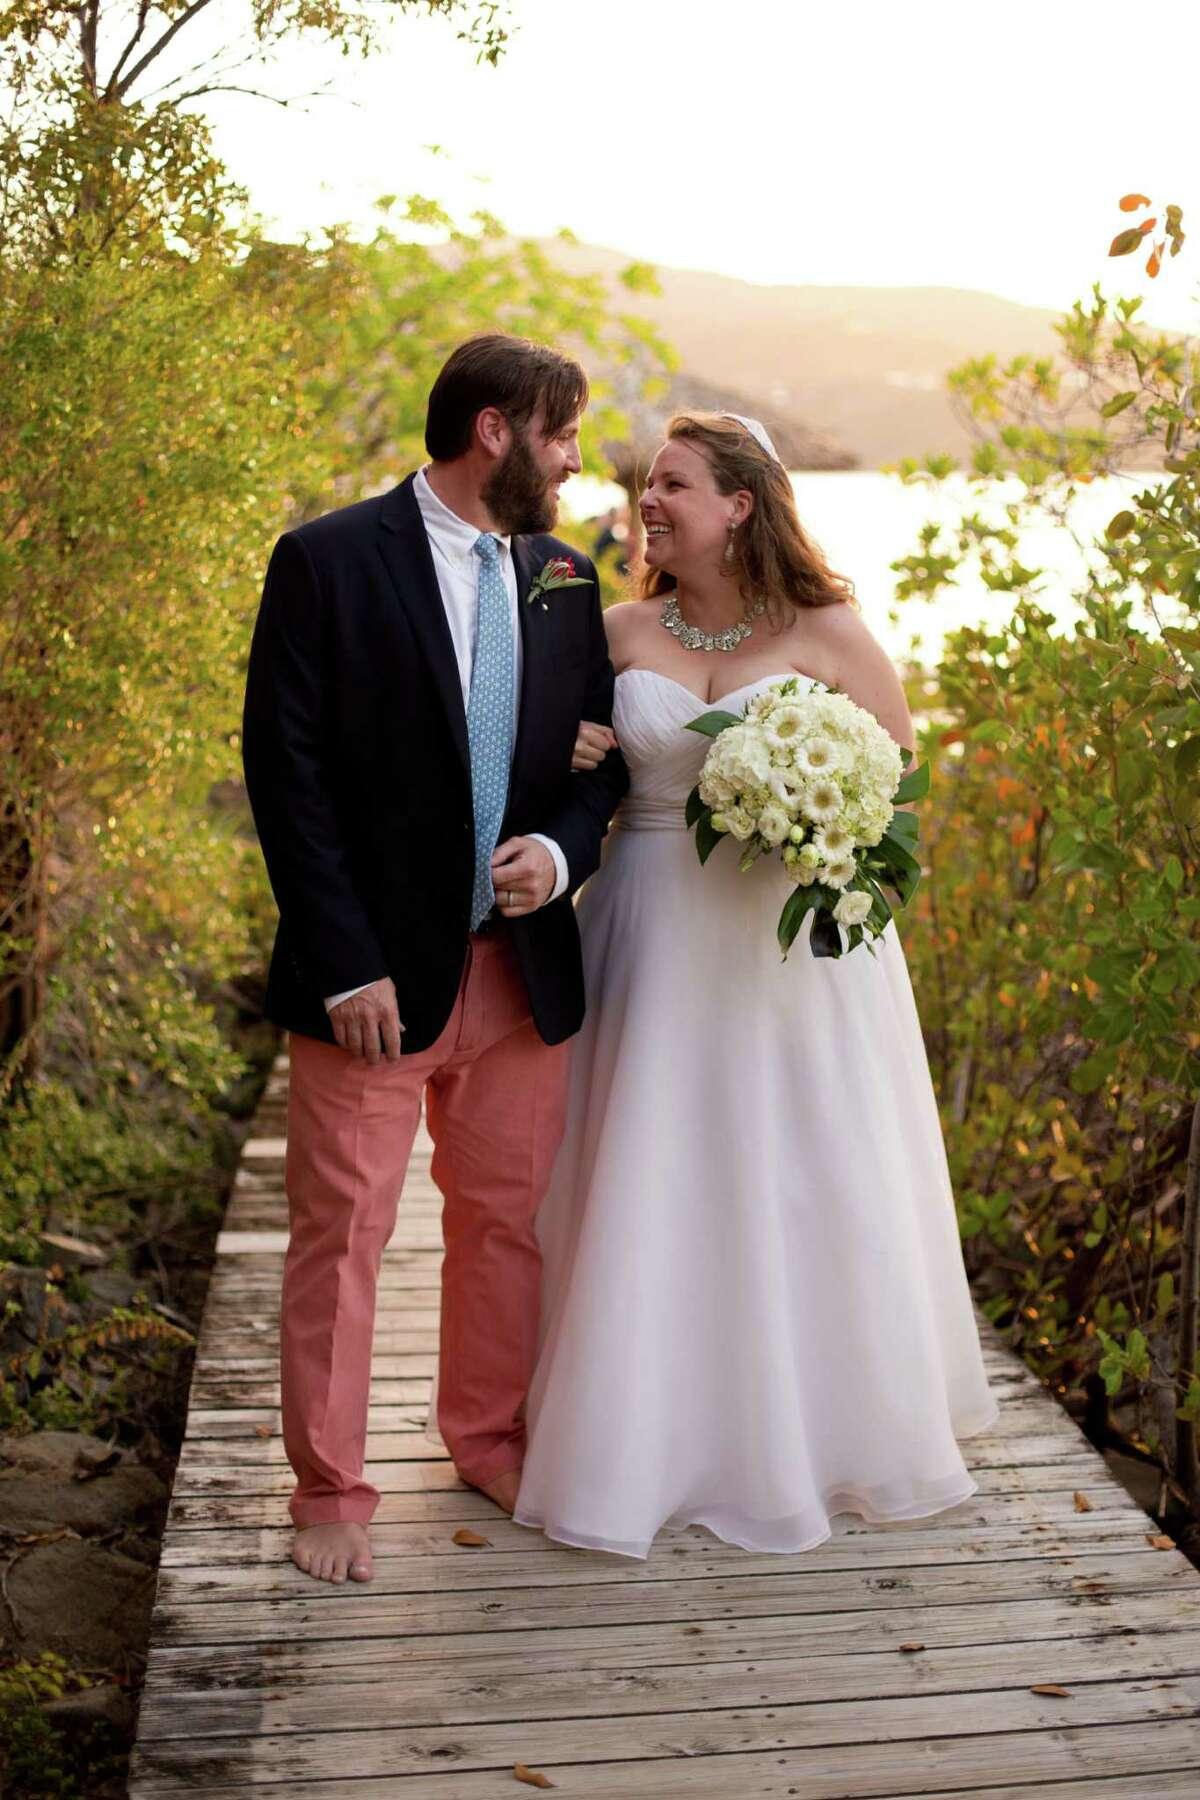 Dorothy Gamber, a graduate of Darien High School, married Christian Friedrich in May.